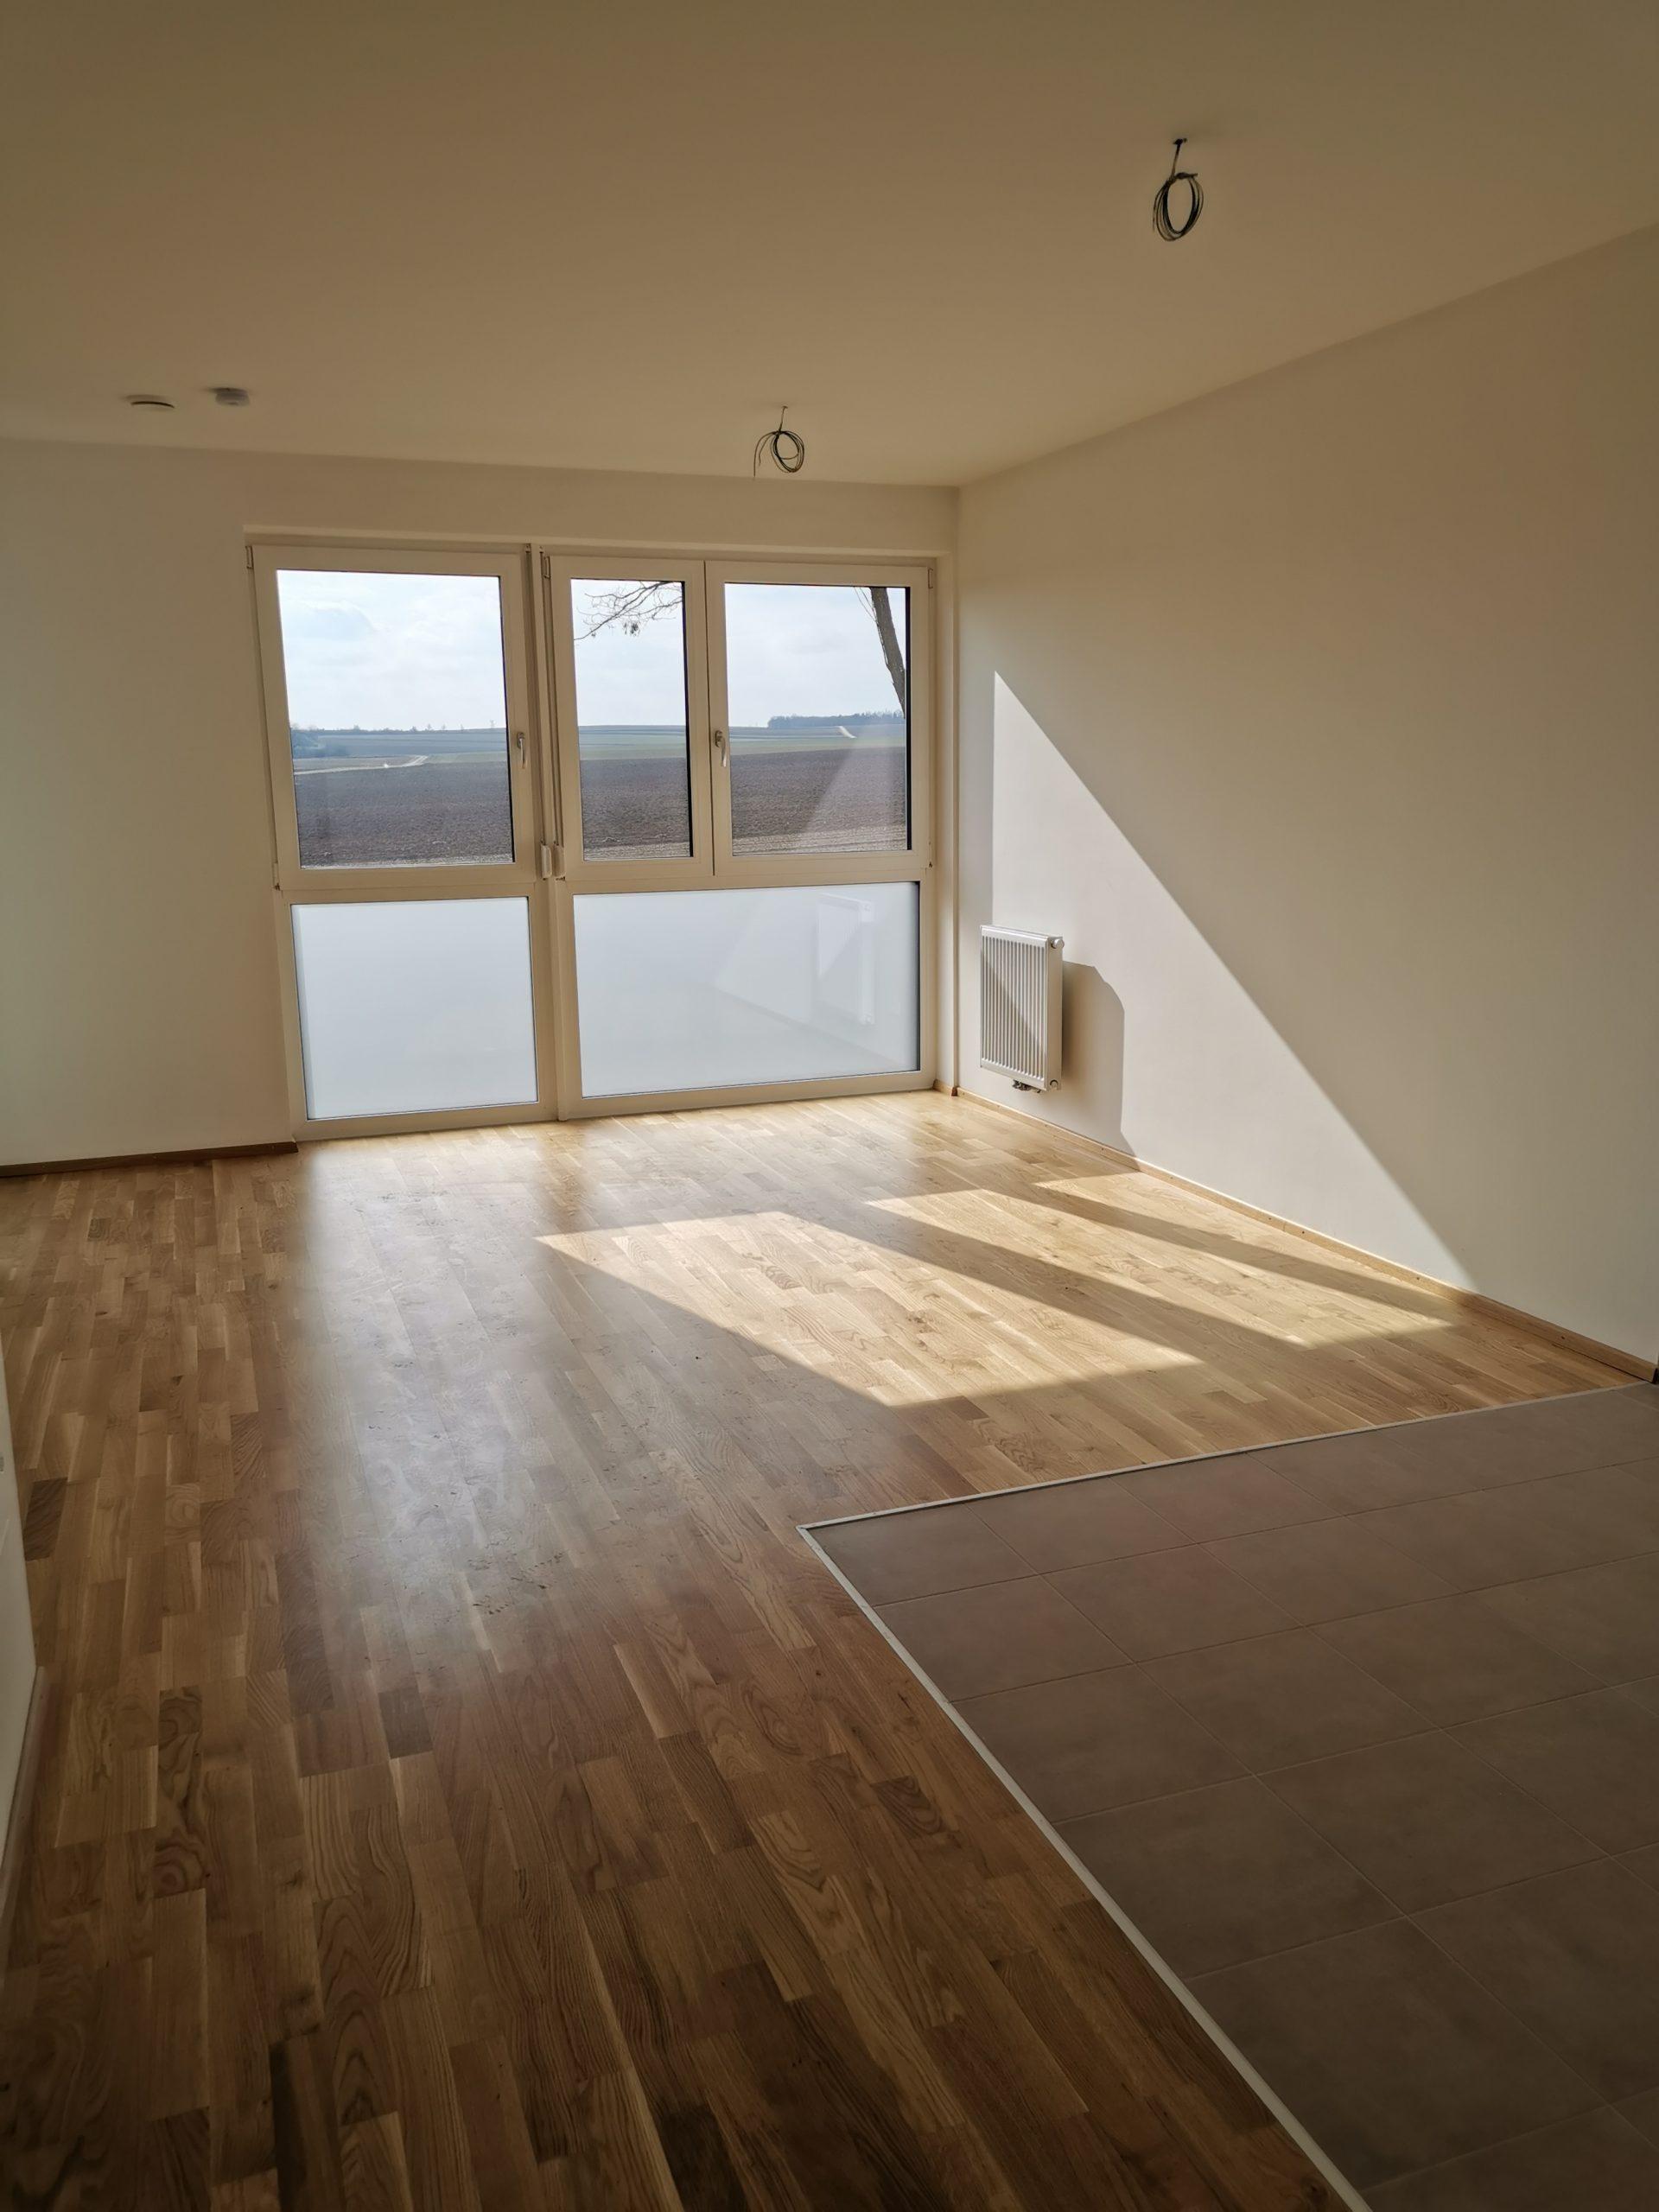 Immobilie von Kamptal in 3730 Eggenburg, Horn, Eggenburg VII - Top 107 #4